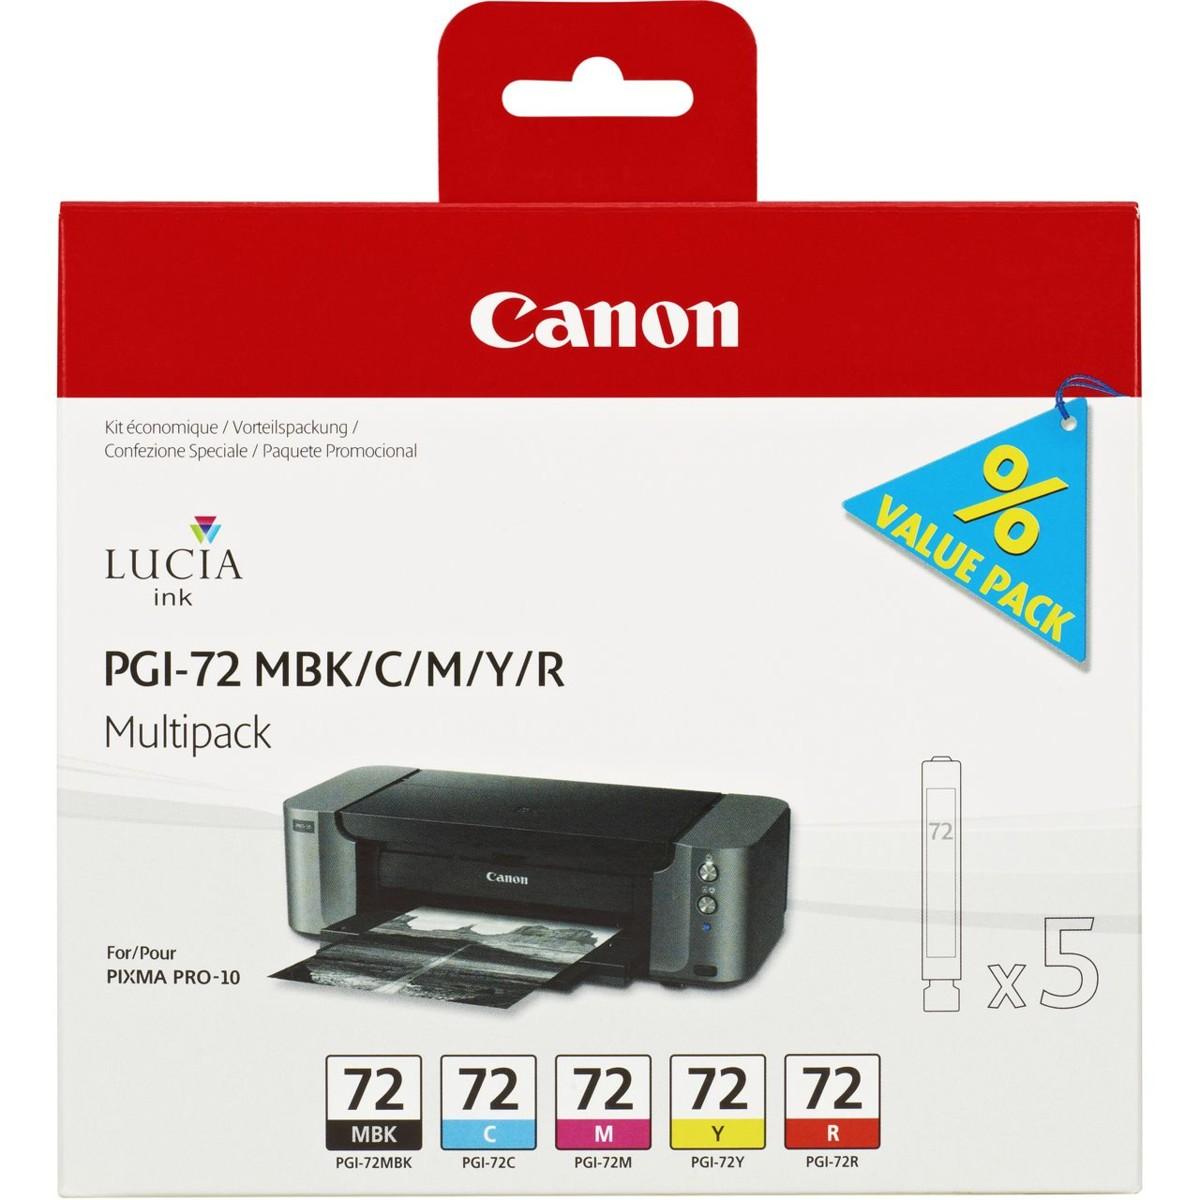 Sada Canon PGI-72 MBK / C / M / Y / R, 6402B009, Multi-pack - originálný